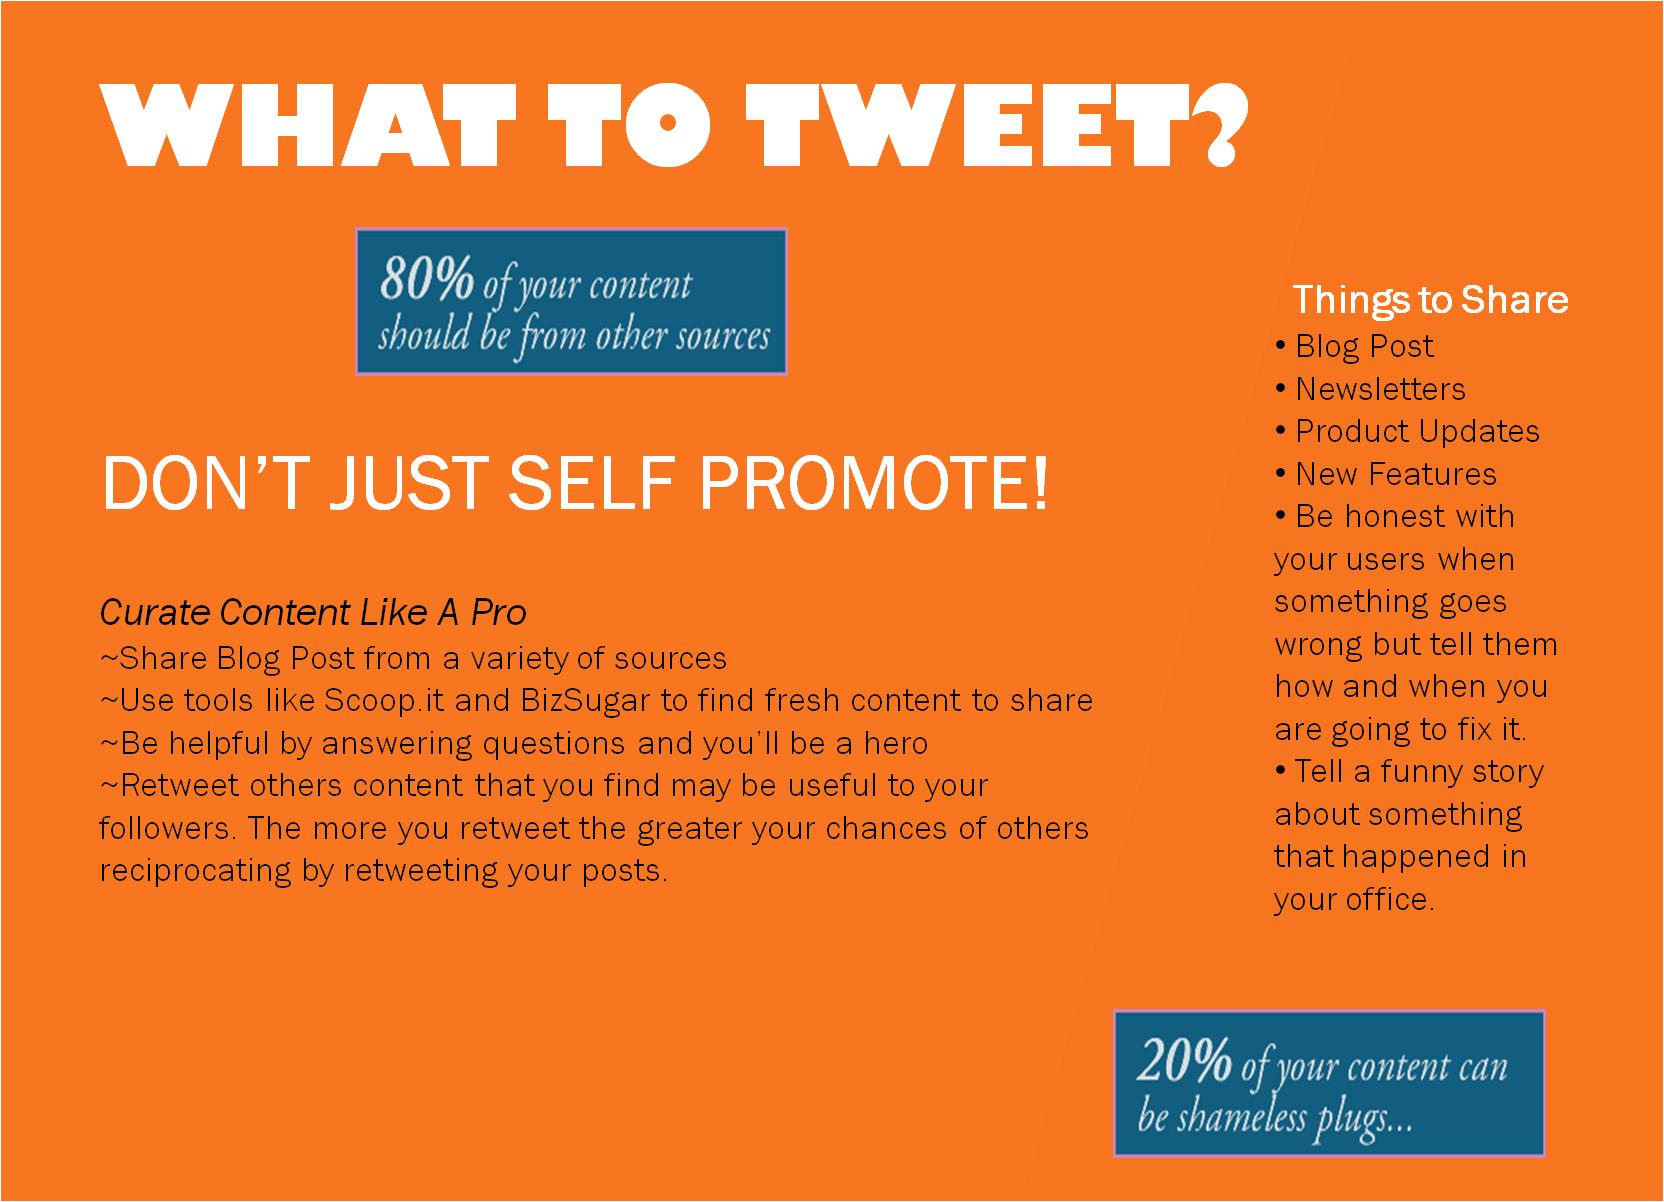 Follow the 80/20 rule of tweets.